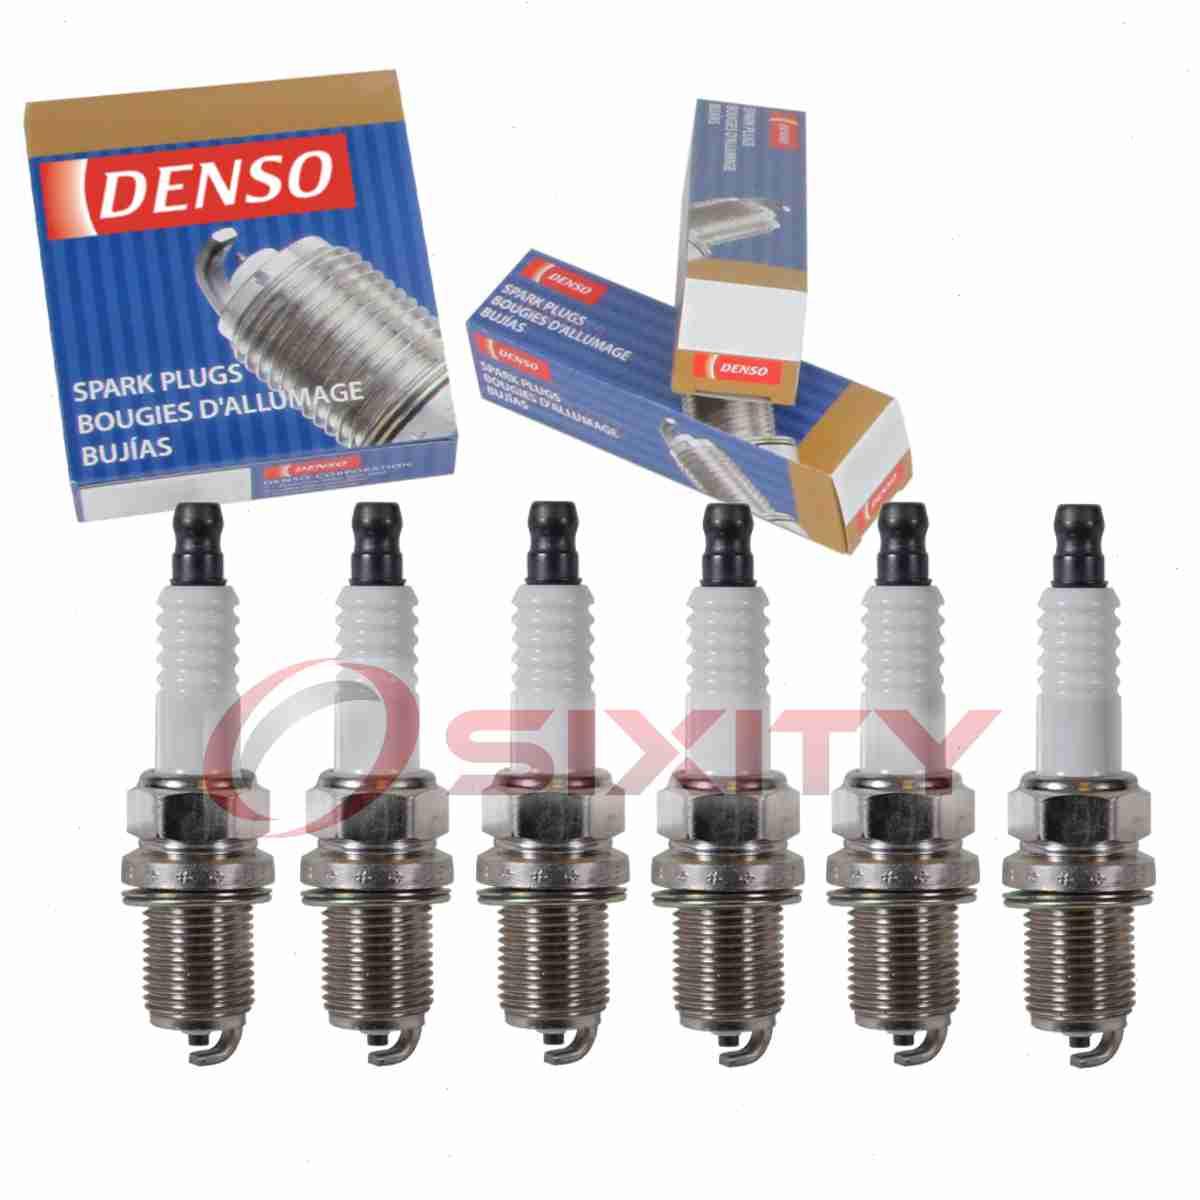 Details about 6 pc Denso Standard Spark Plugs for Hyundai Sonata 3 3L V6  2006-2010 Tune Up de